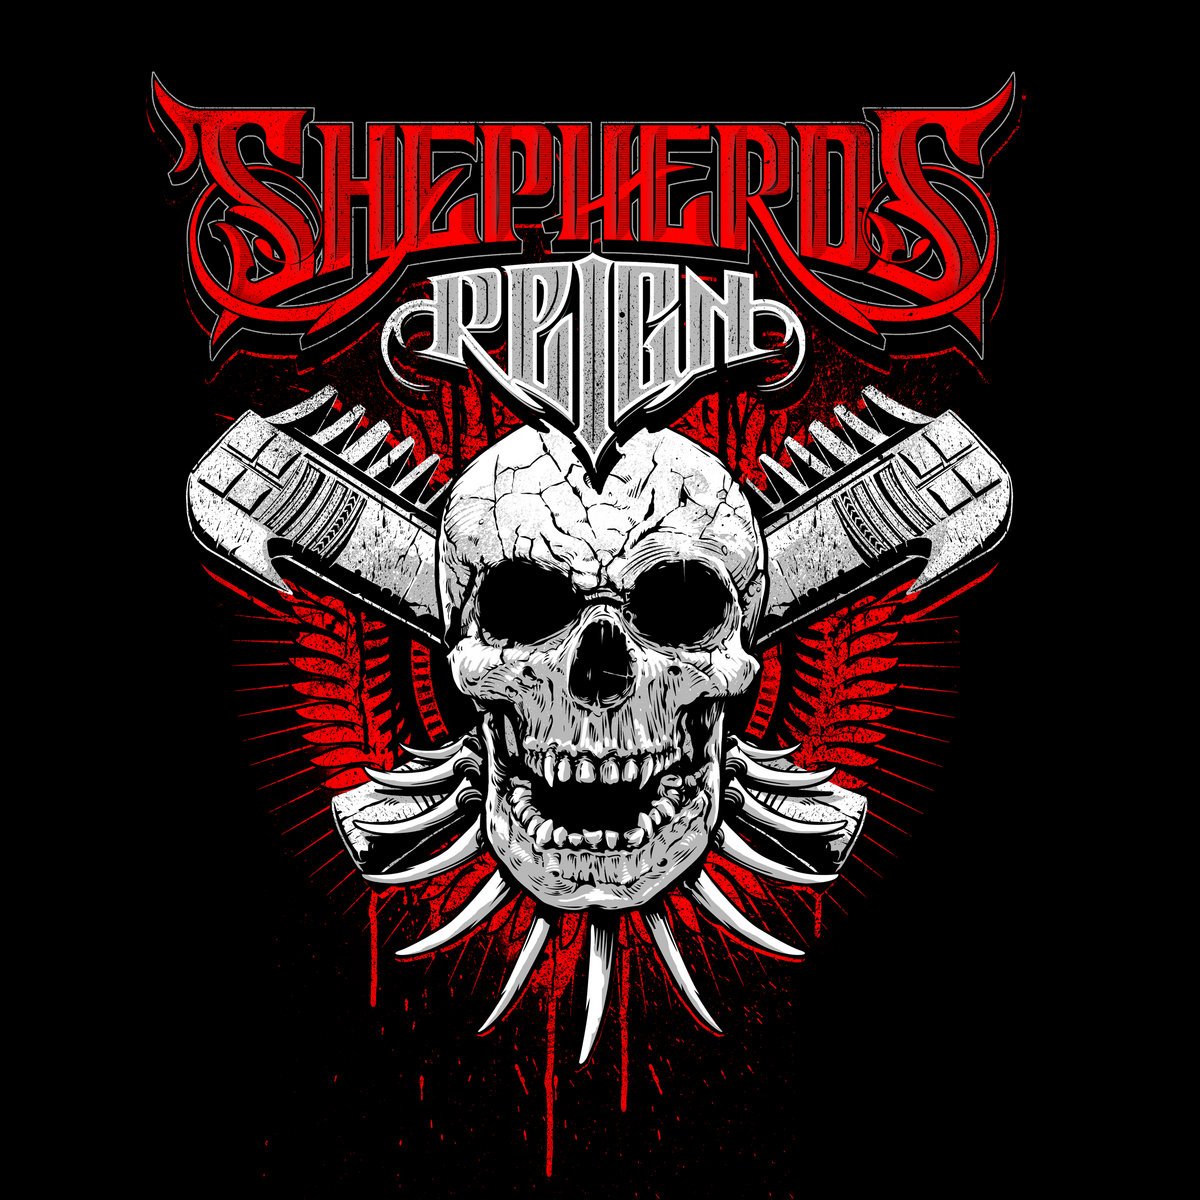 Shepherds Reign - Shepherds Reign